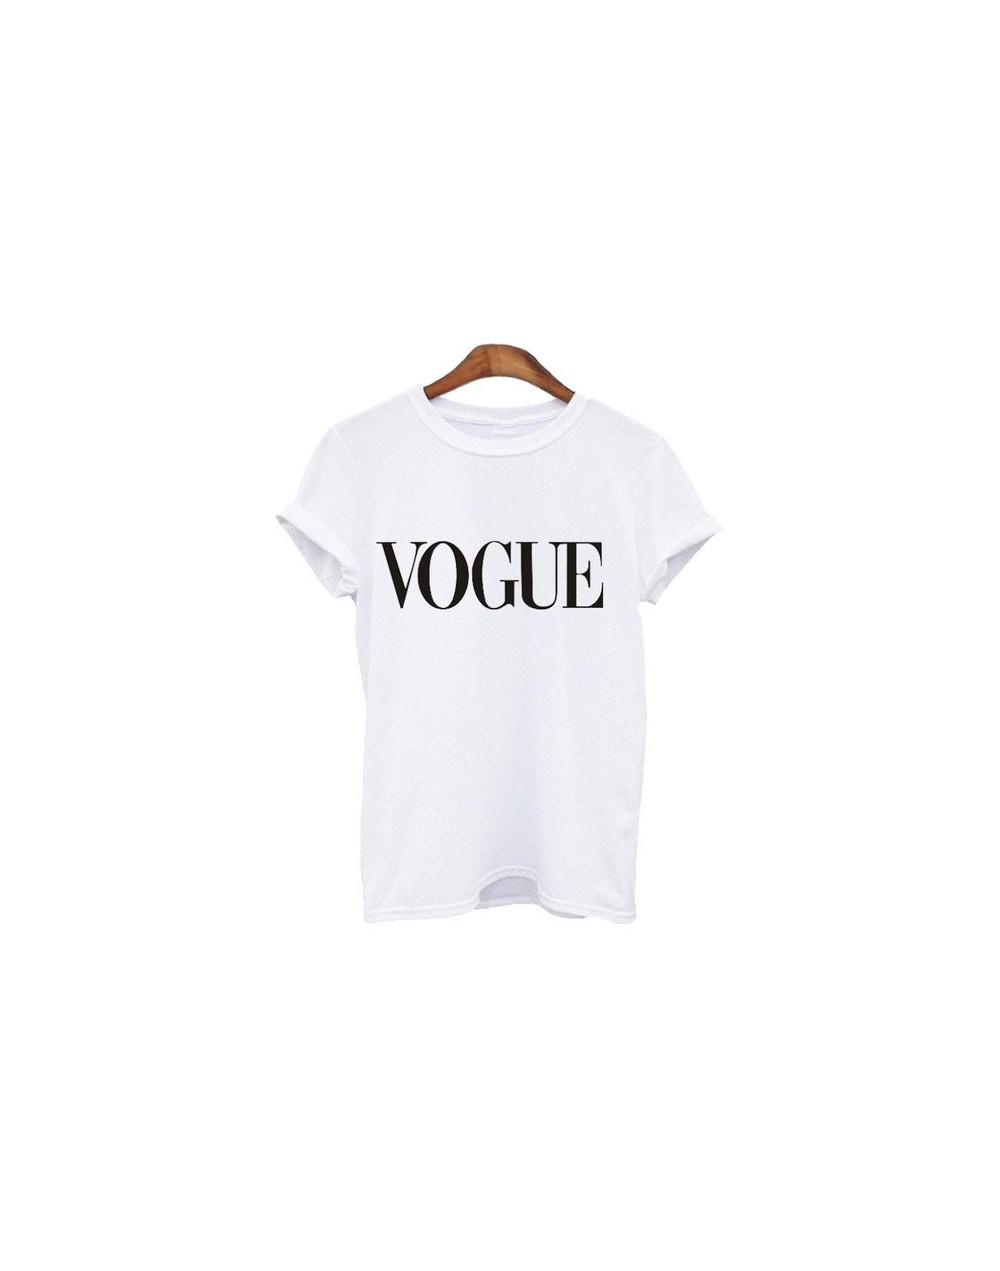 Humor Tea Print T Shirt For Women Clothing 2018 Summer Funny Female T shirts Harajuku Tee Tumblr Hipster Ladies T-shirt - Wo...